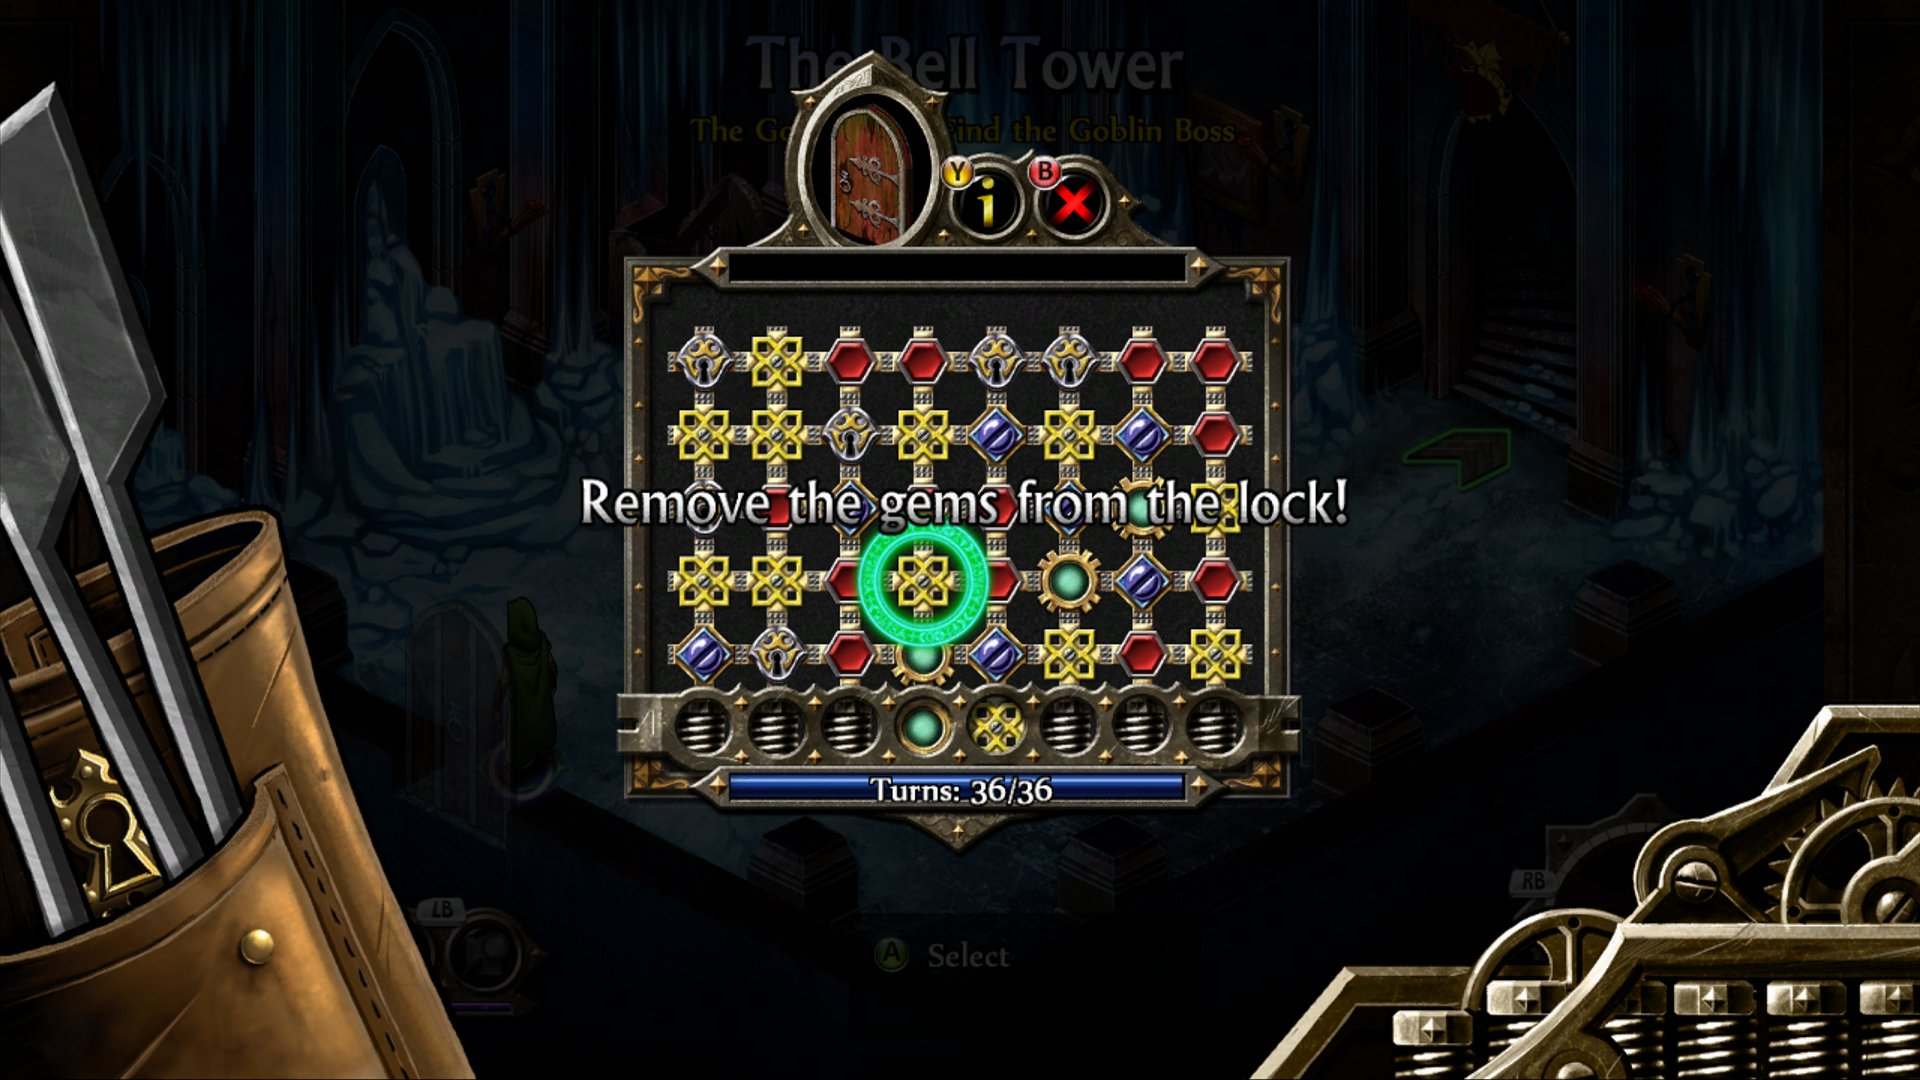 Puzzle Quest 2 - Immagini multiformato